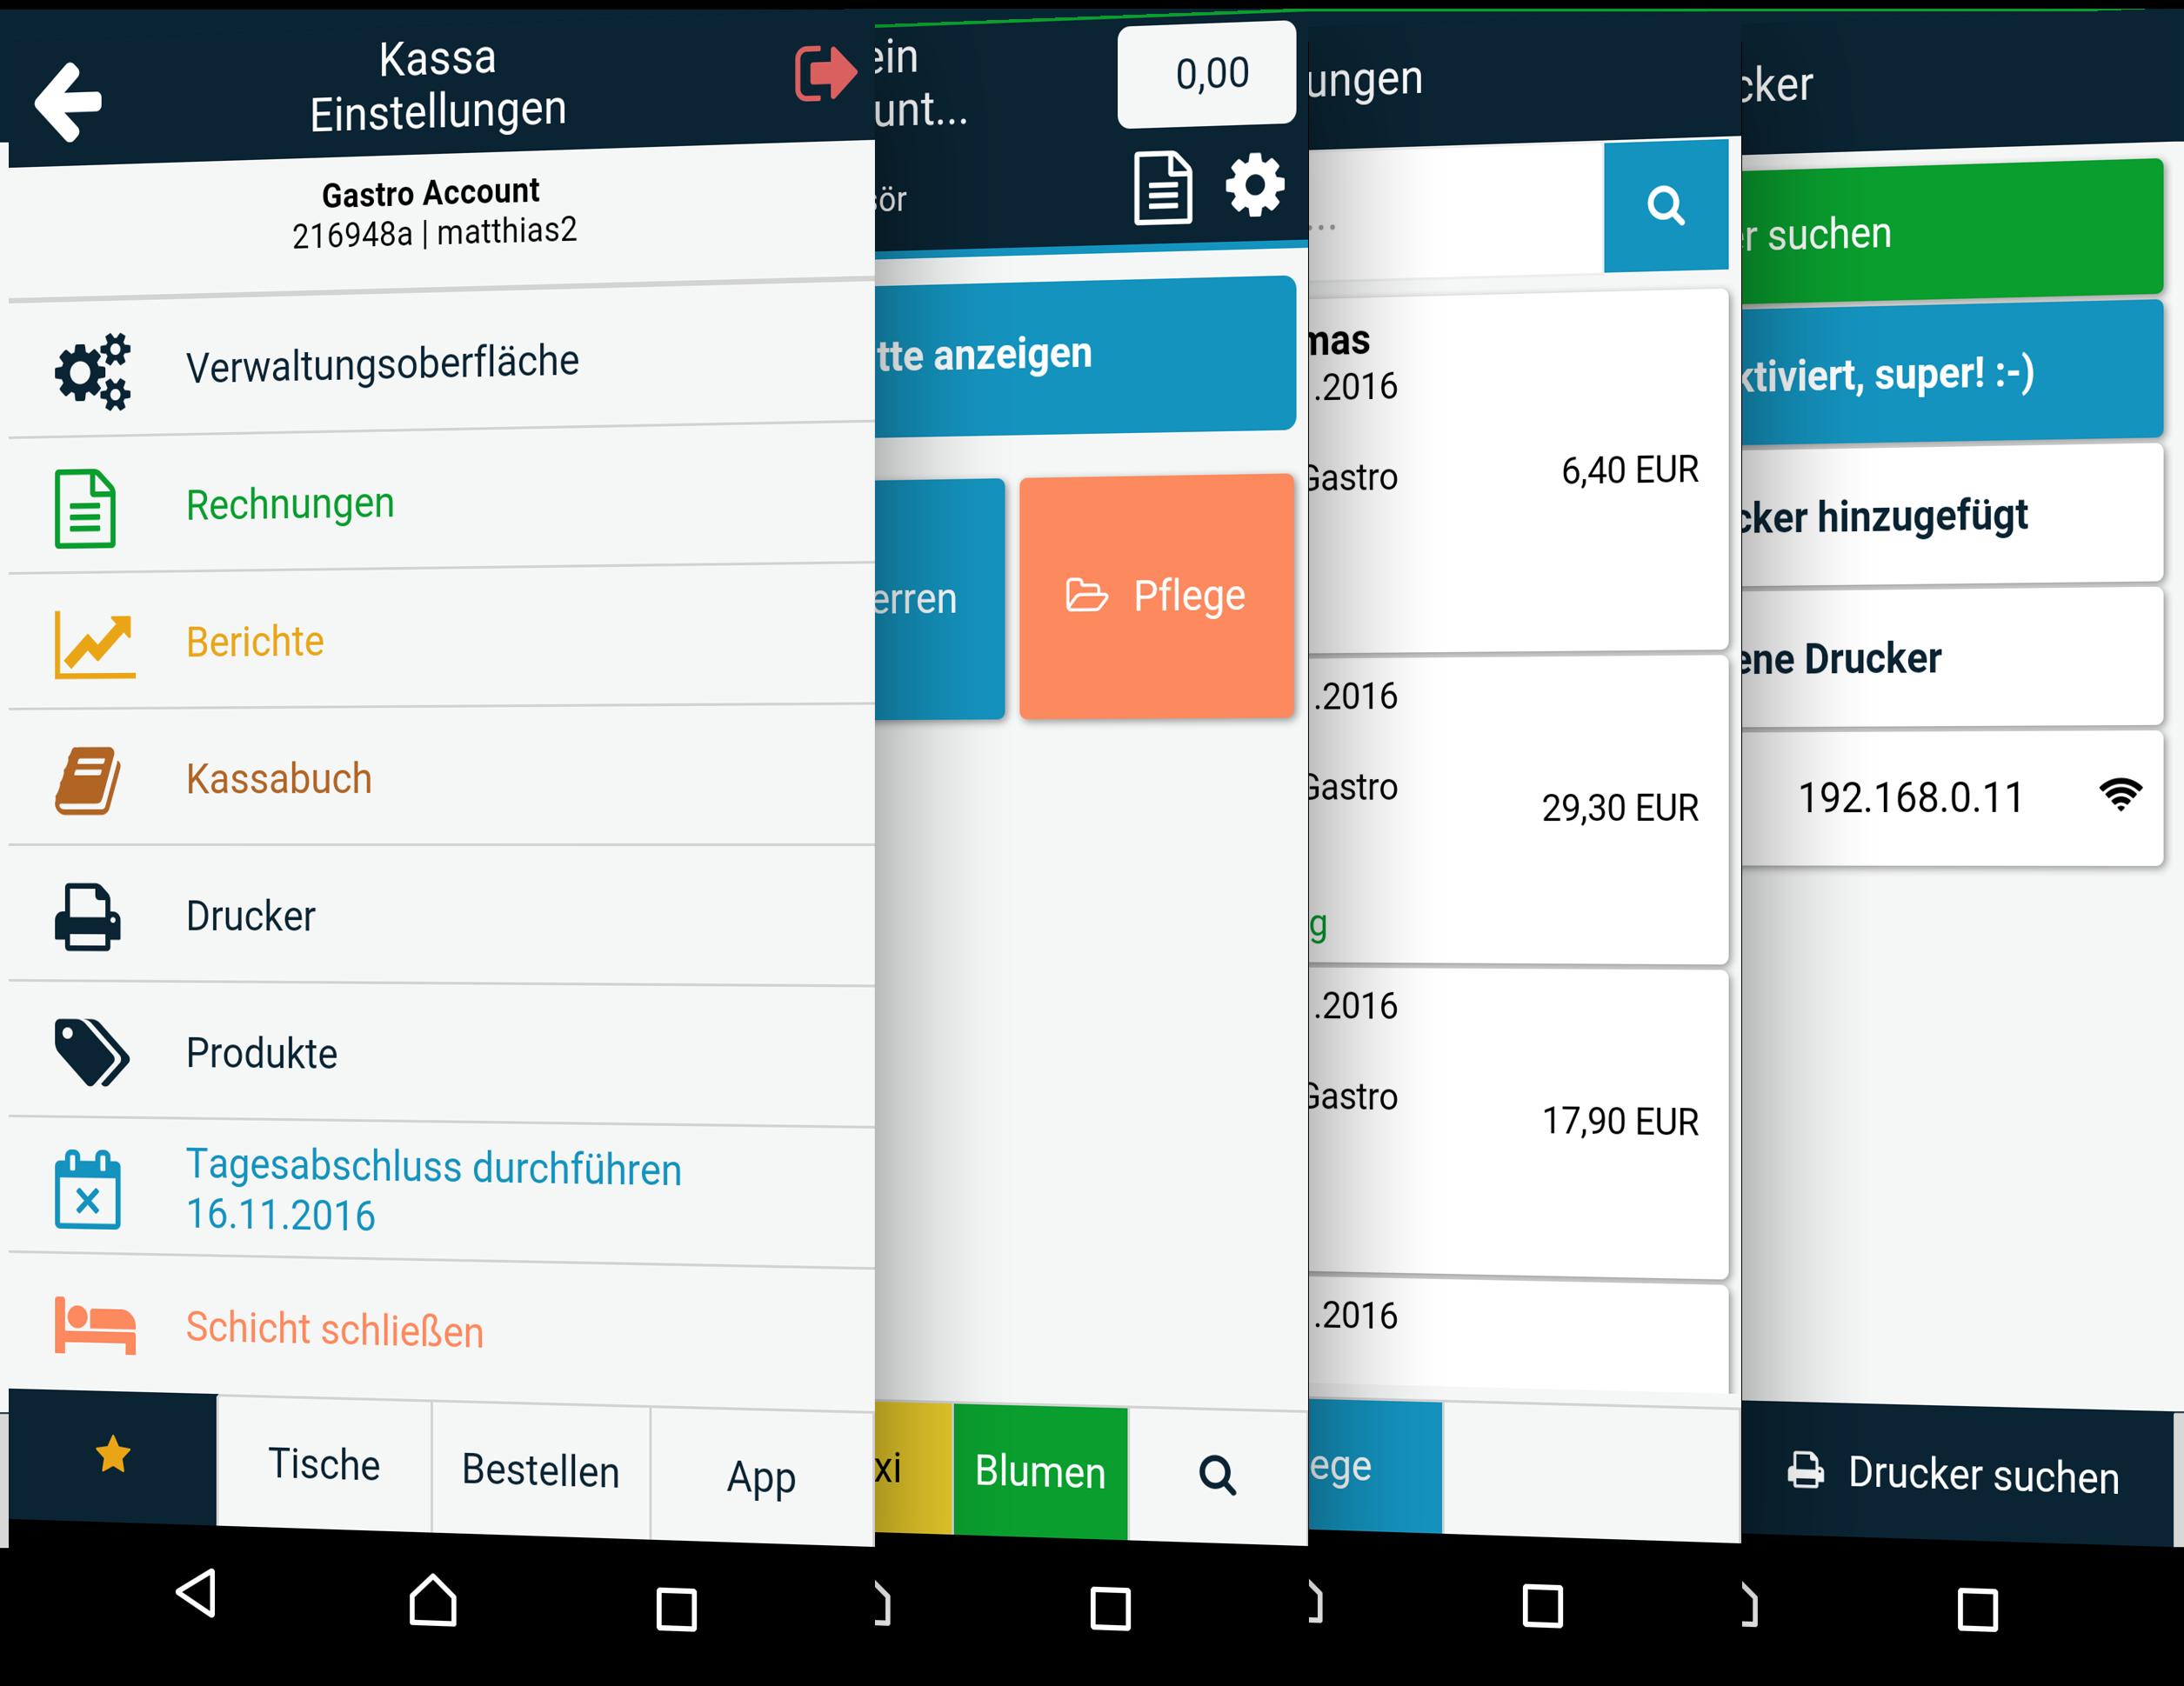 Registrierkasse als App in der Kasse